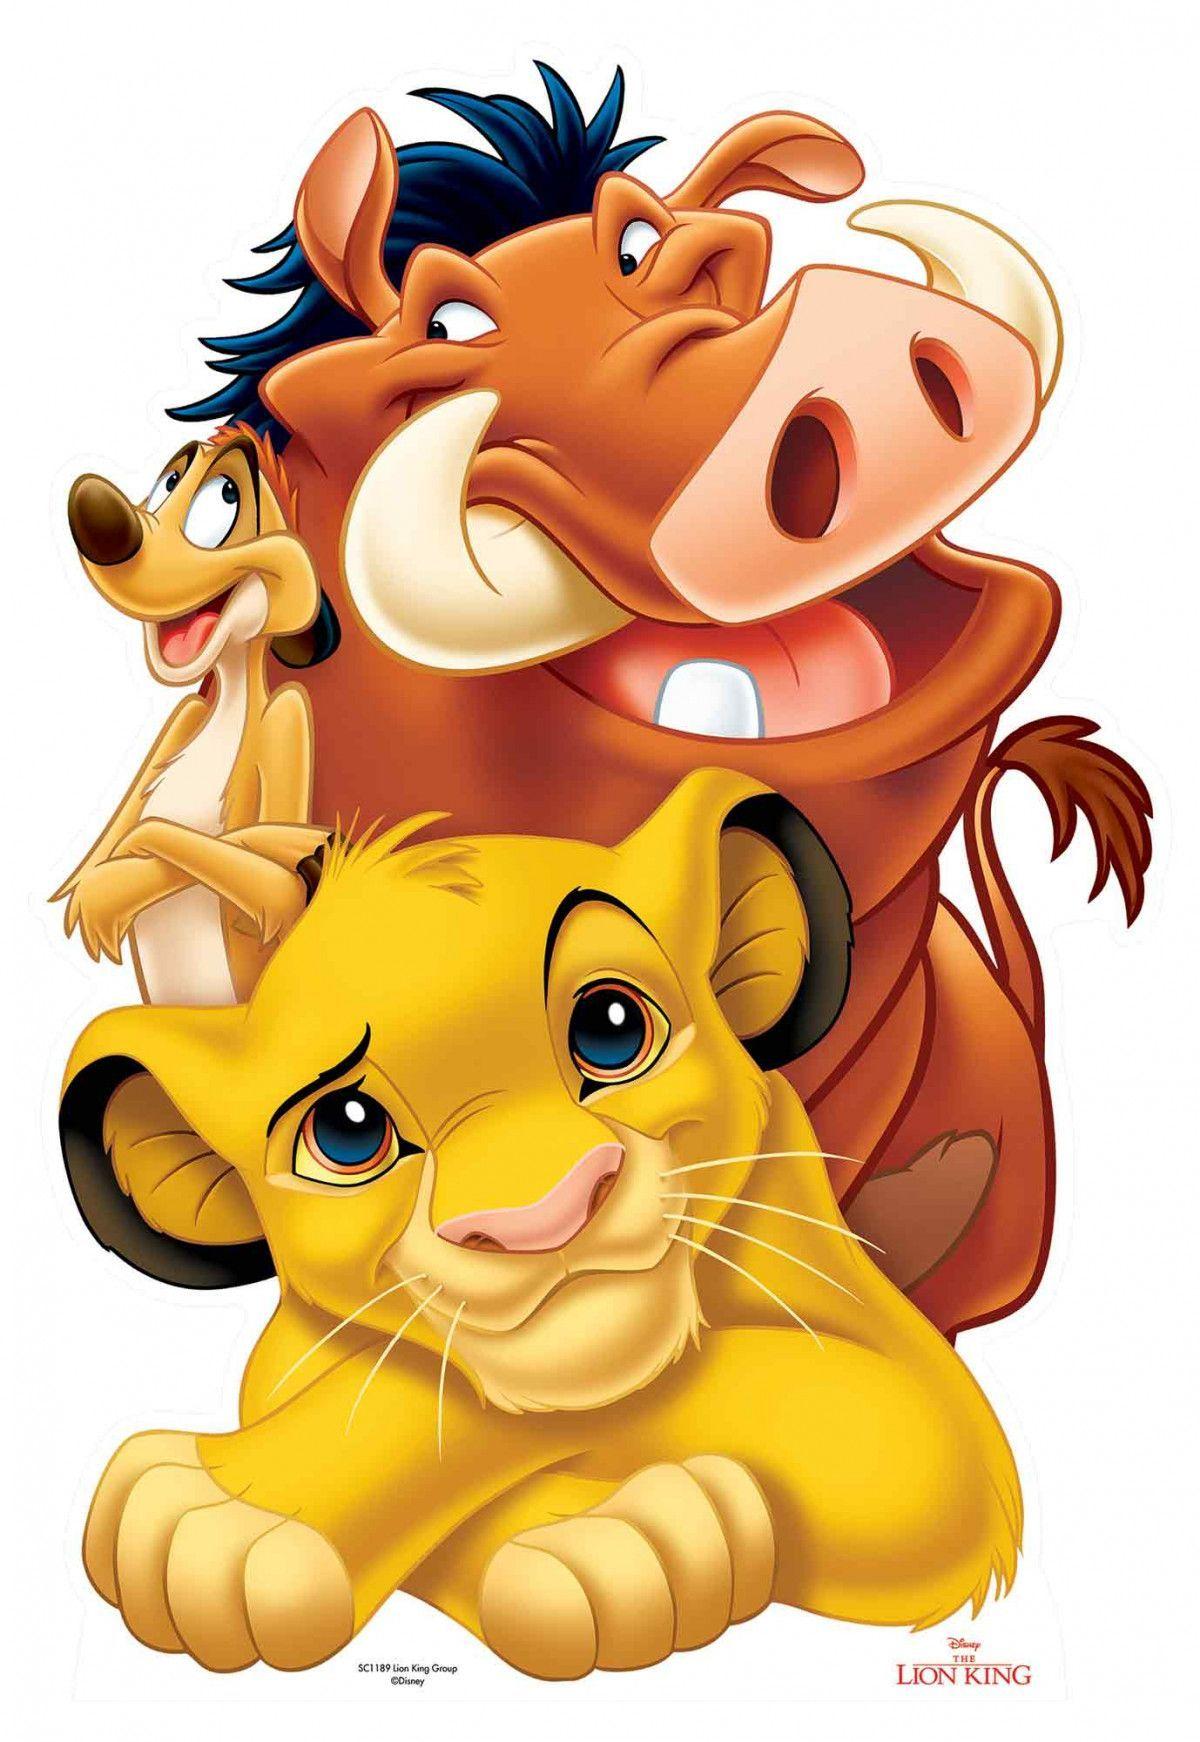 Wallpapers Lion King Art Wallpapers Lion King Disney Schizzi Dipinti Disney Re Leone